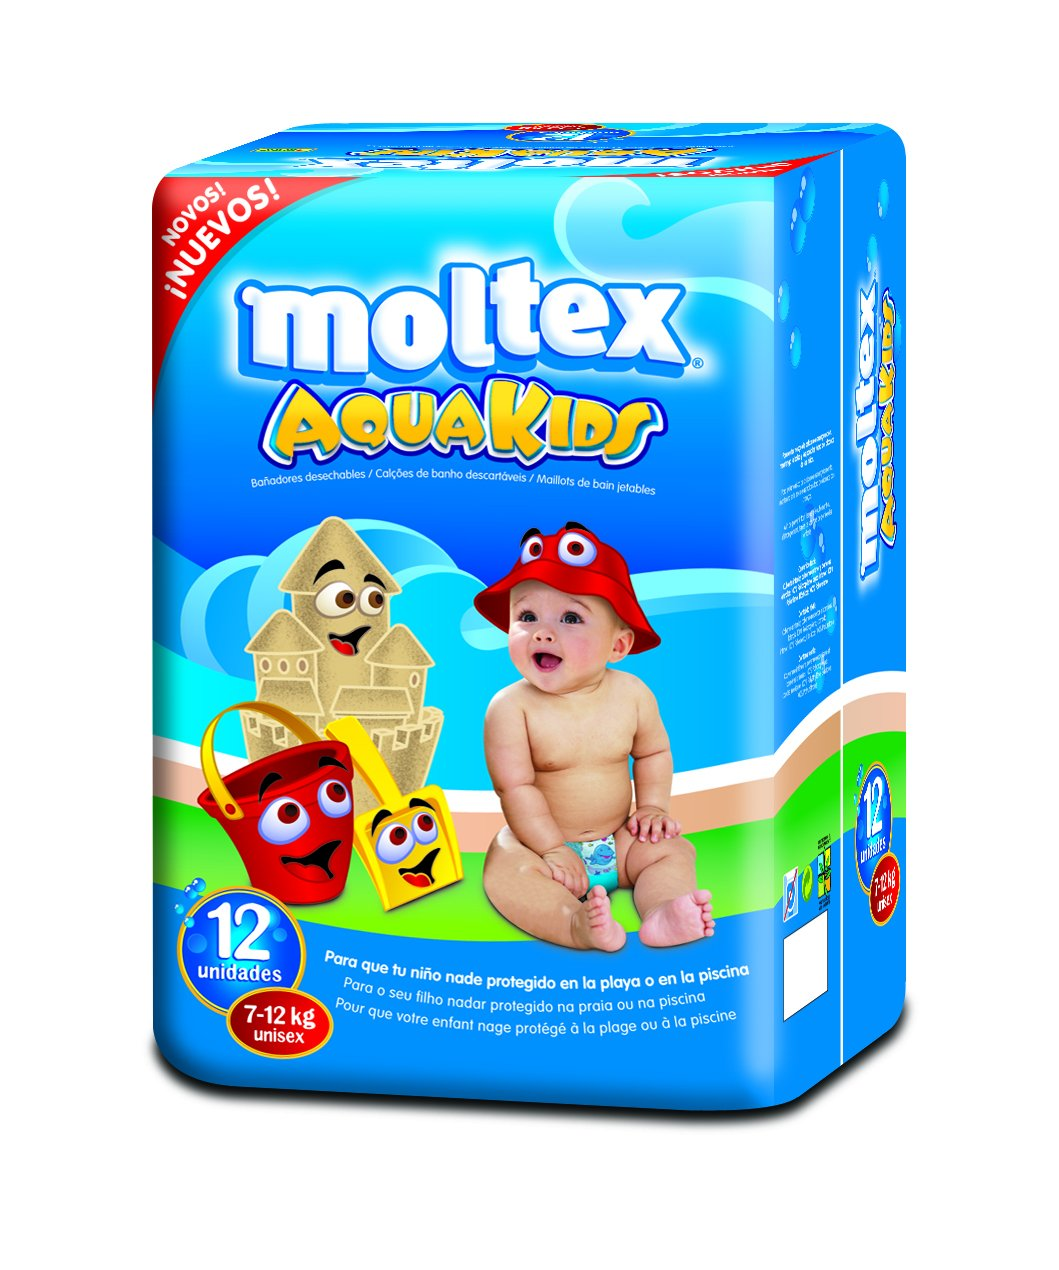 Moltex Aquakids Bolsa de Calzones Entrenadores - 12 Calzones: Amazon.es: Bebé